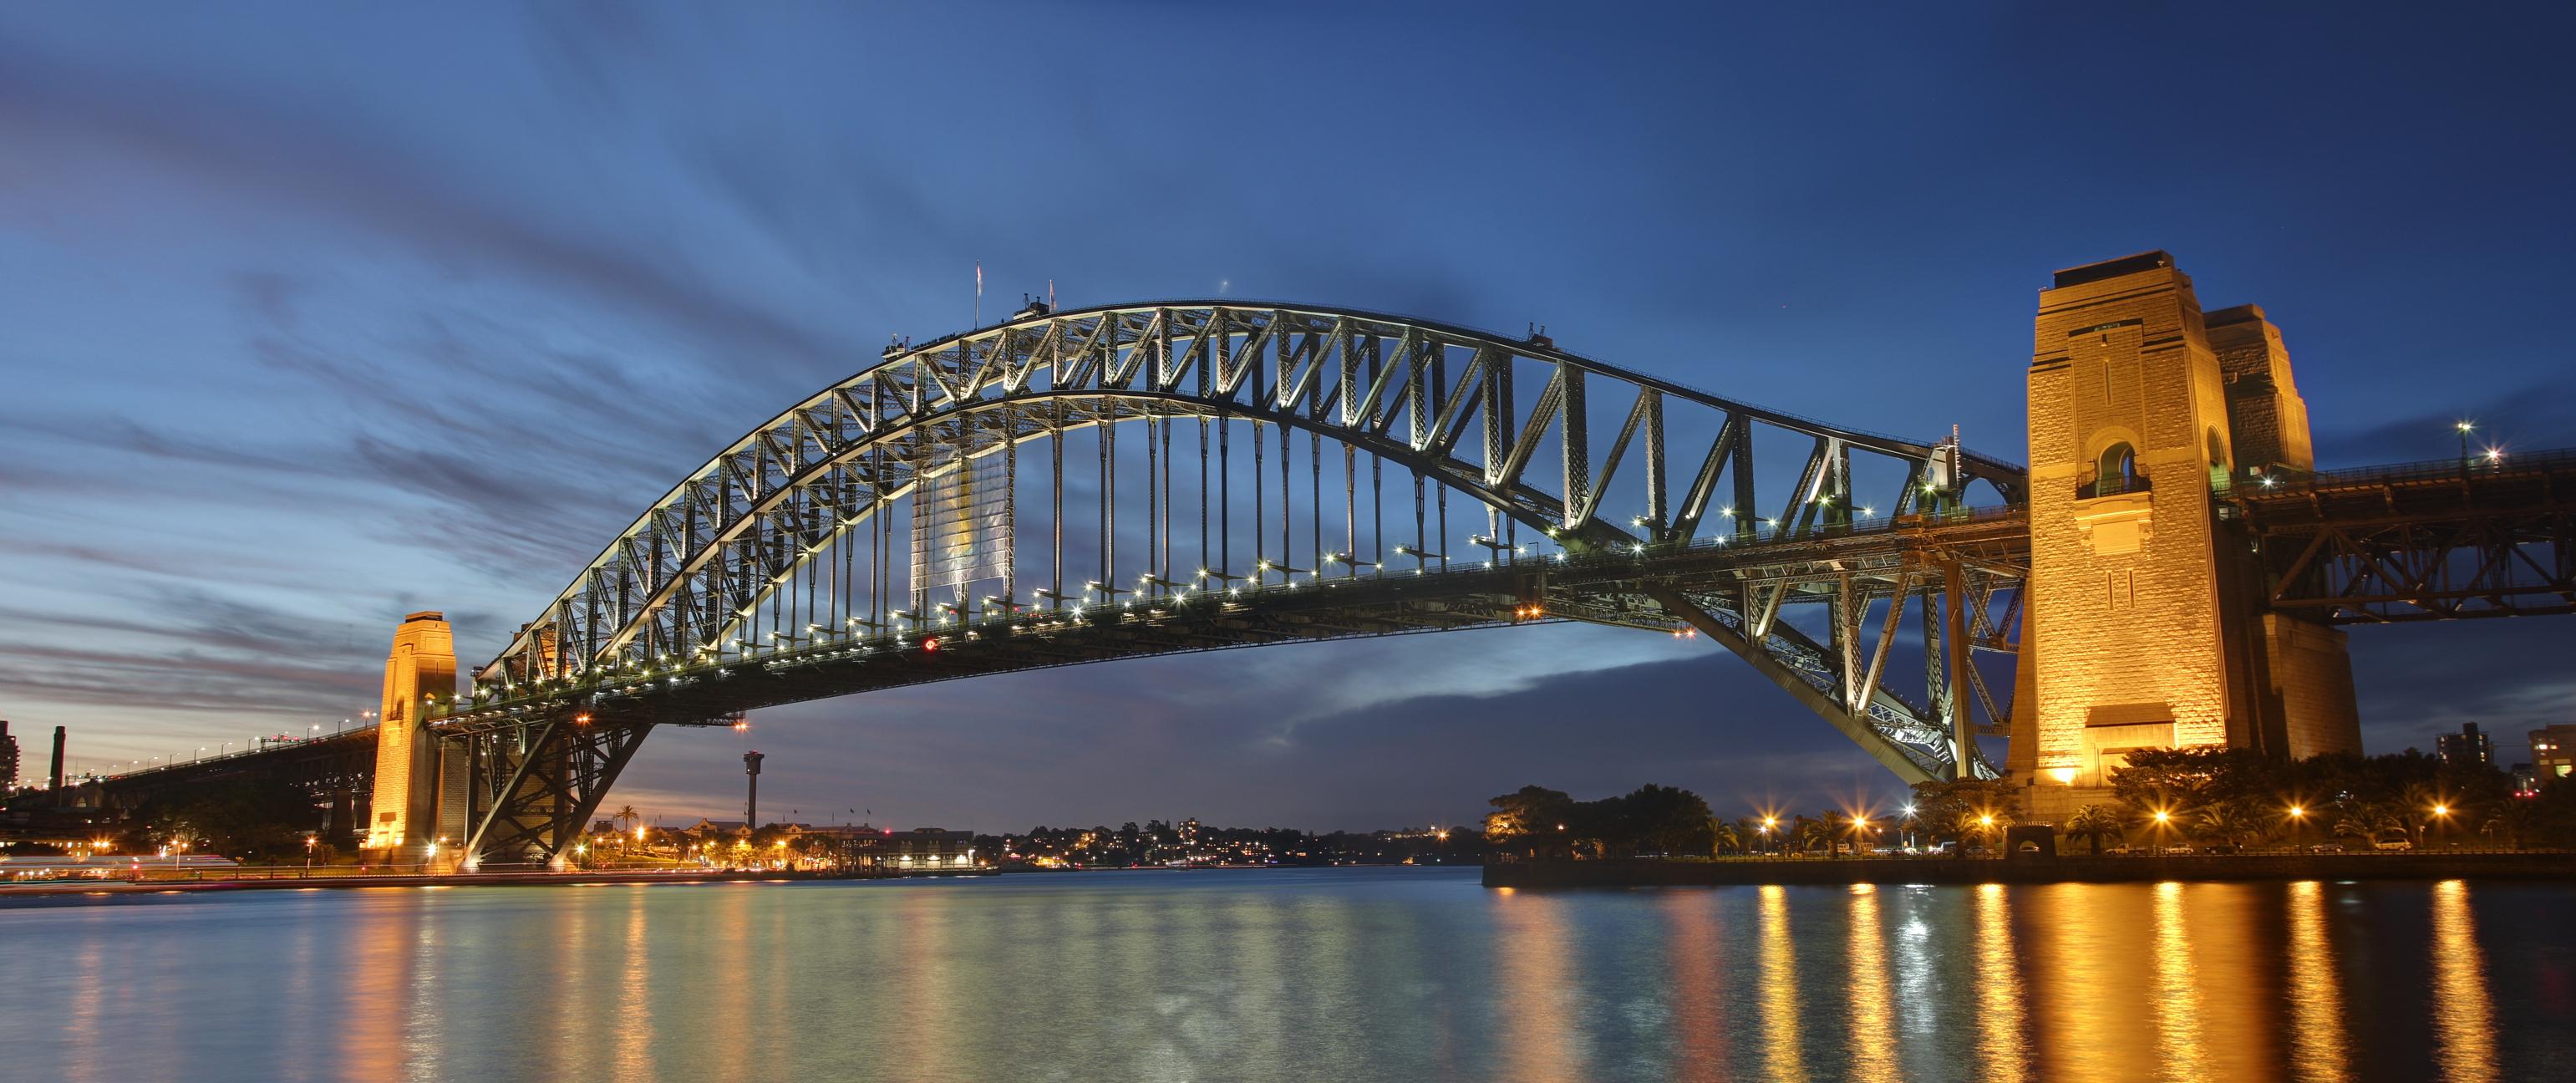 Arhitektura koja spaja ljude - Mostovi - Page 4 Sydney_harbour_bridge_dusk